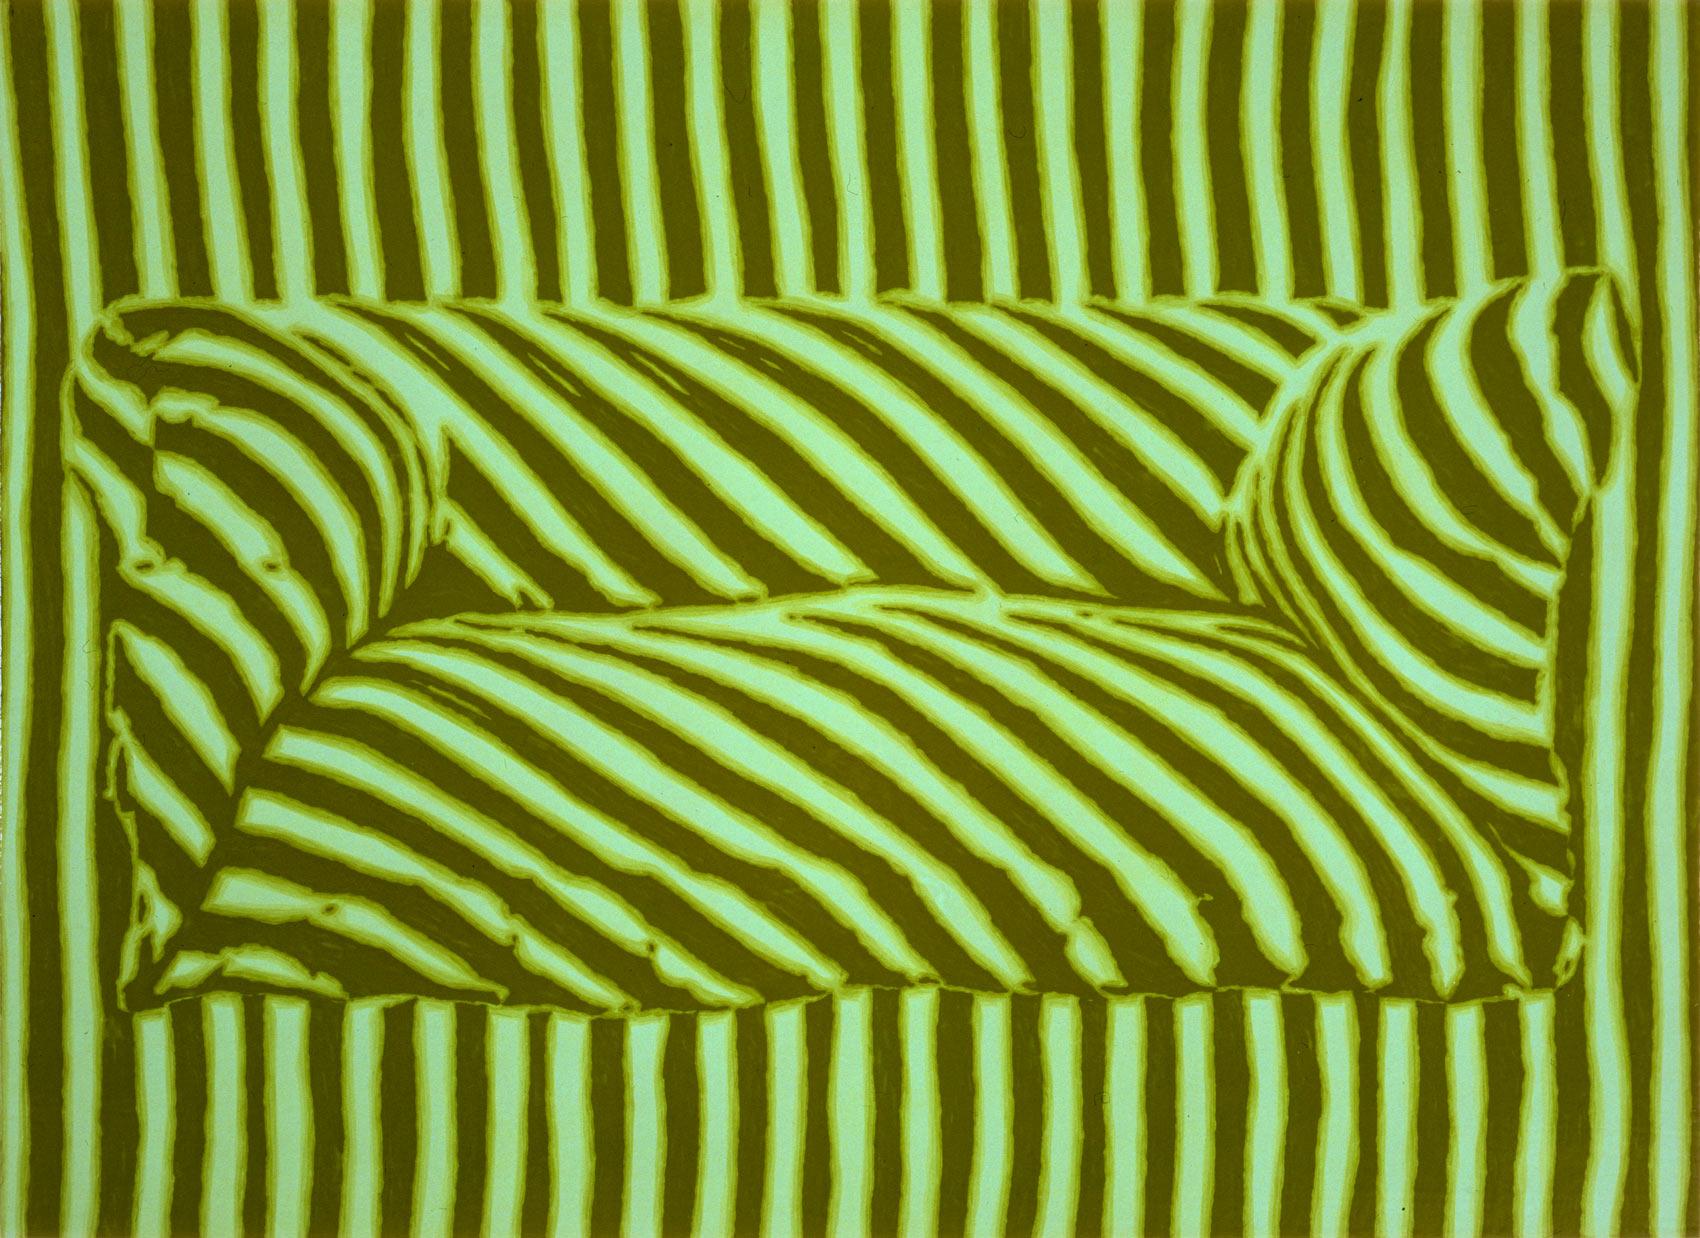 Canapé, 1998, peinture alkyde sur Aerolam, 123 x 163 cm